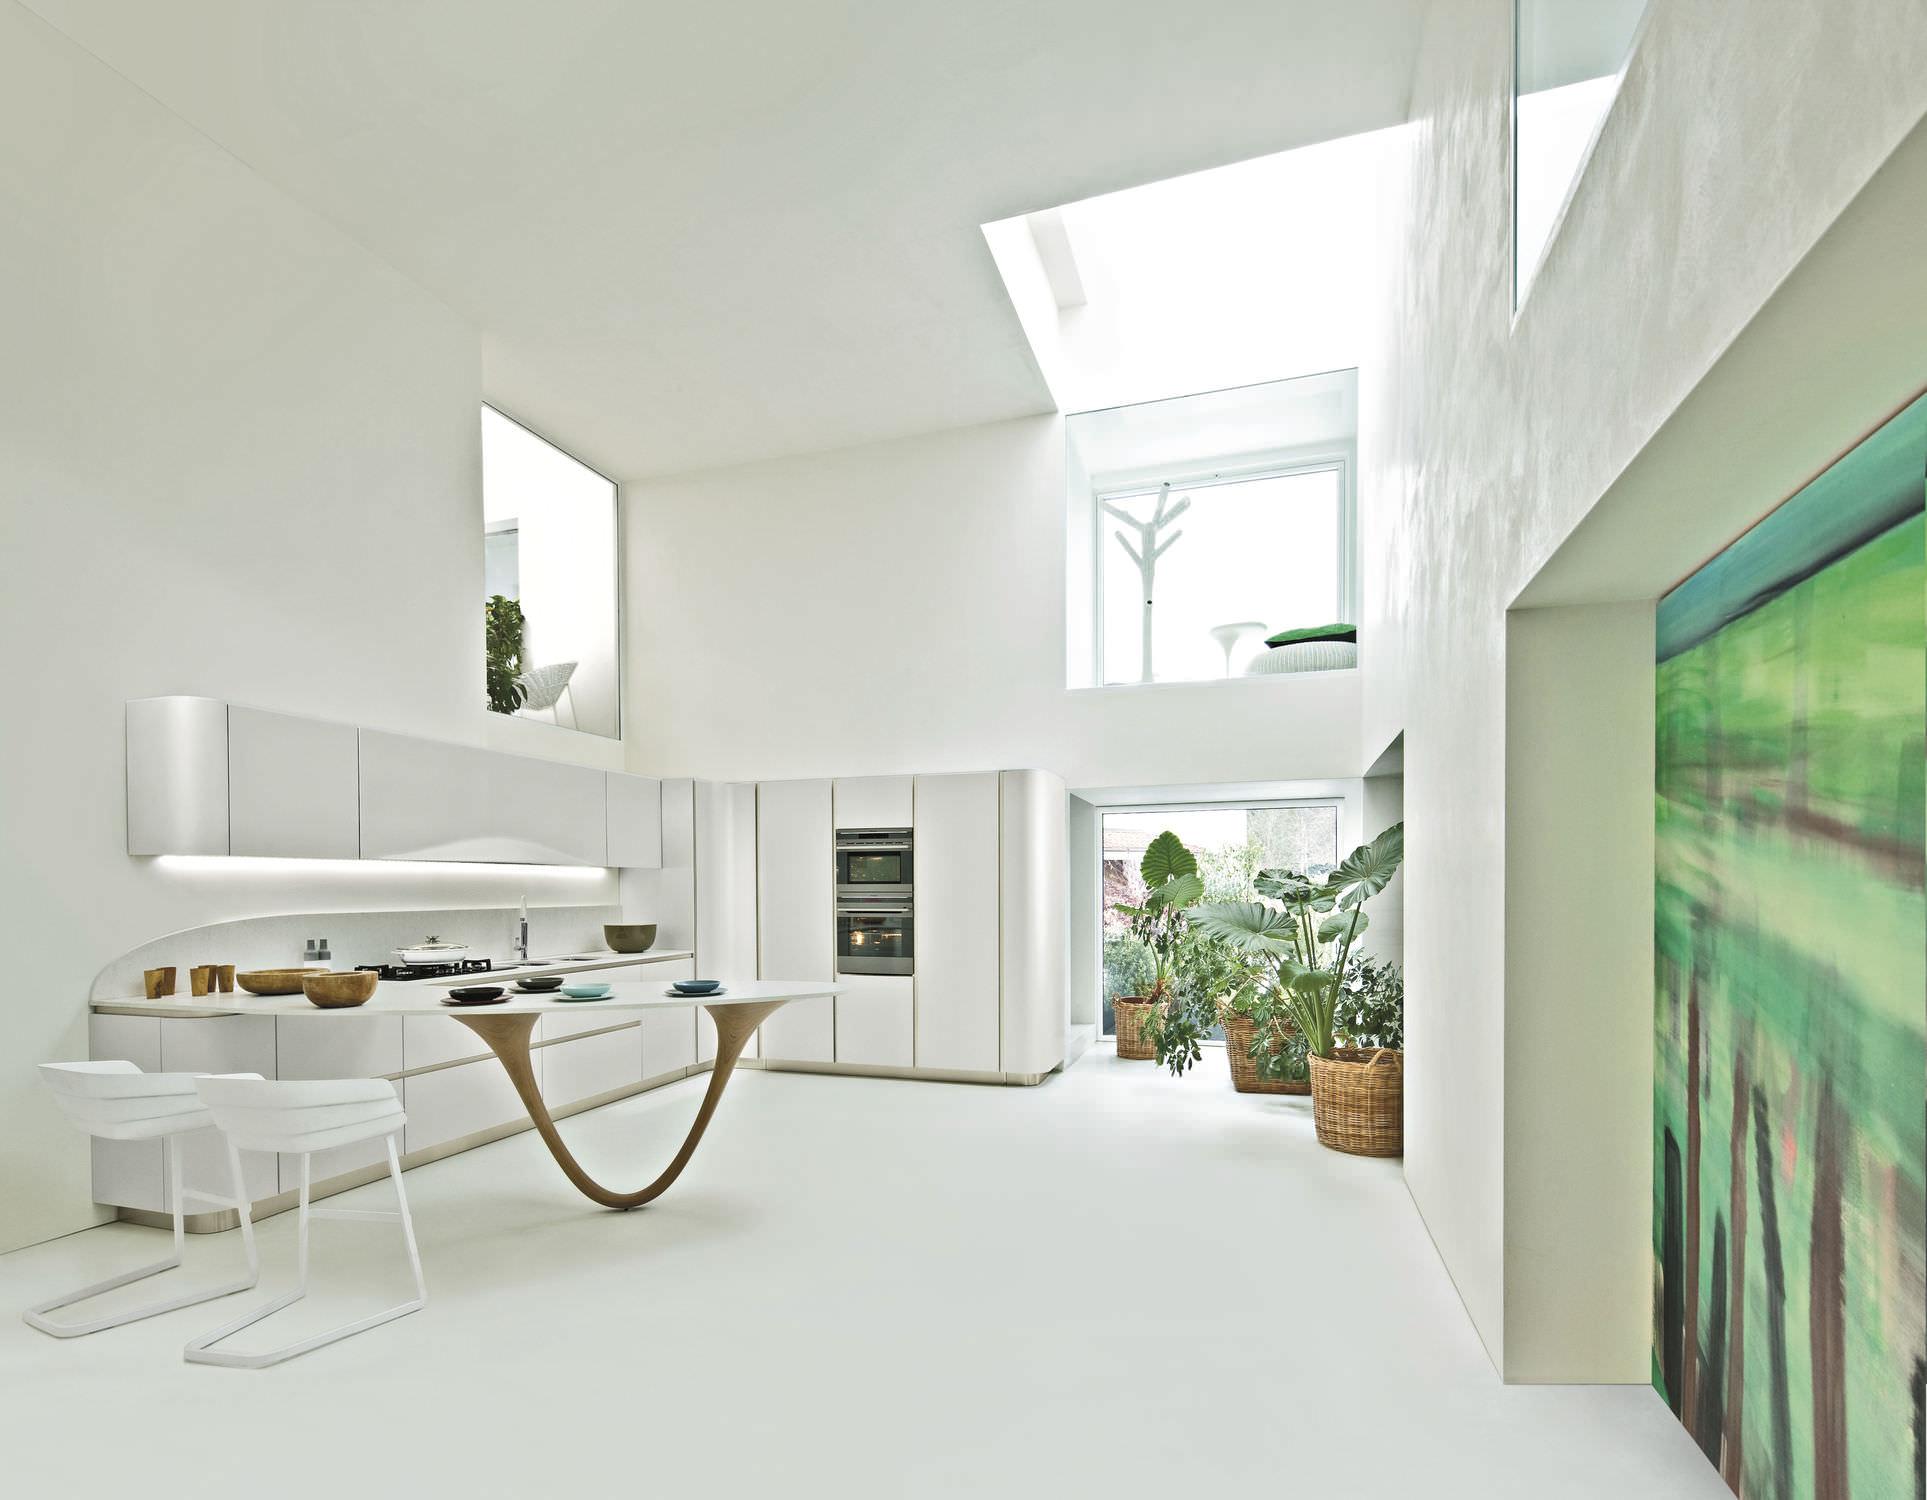 Moderne Küche / Holz / Kochinsel / lackiert OLA 20 by Pininfarina Design  SNAIDERO RINO SPA